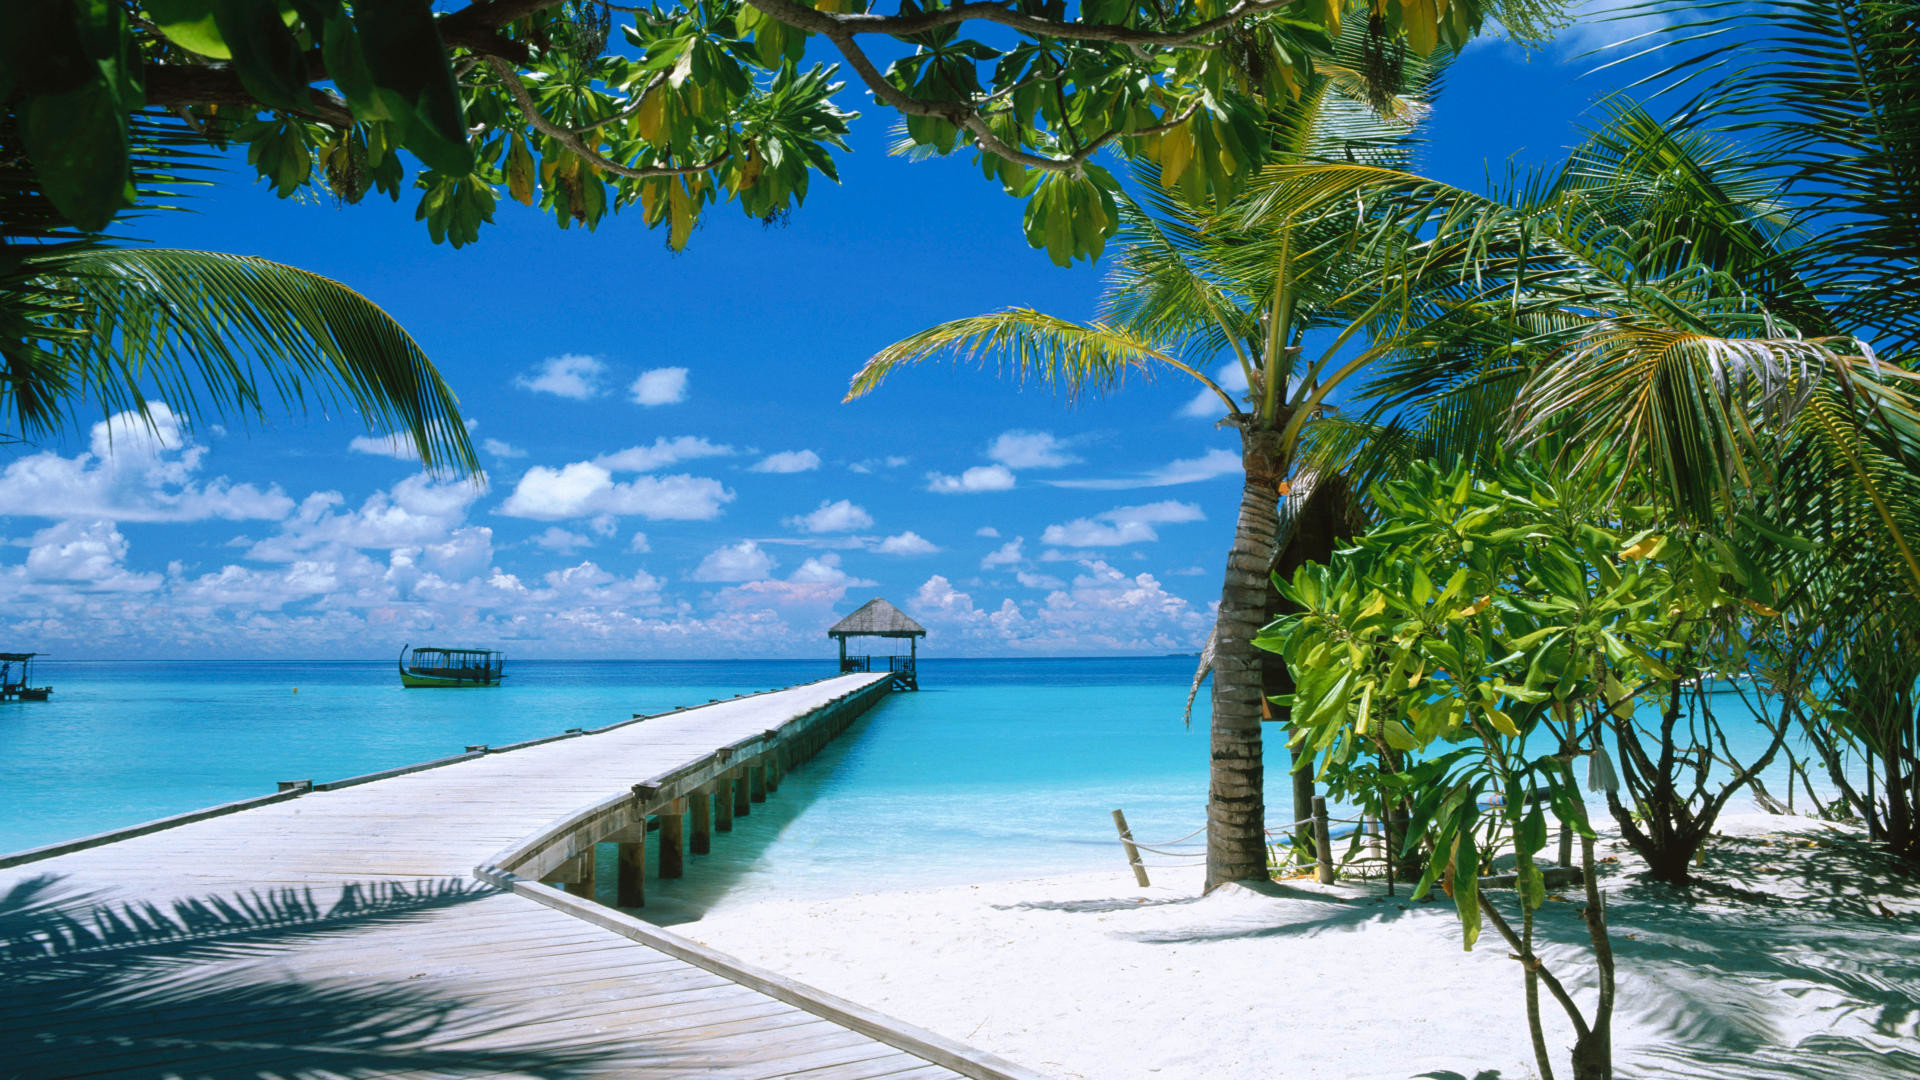 fond ecran plage beach wallpaper maldives HD gratuit – .